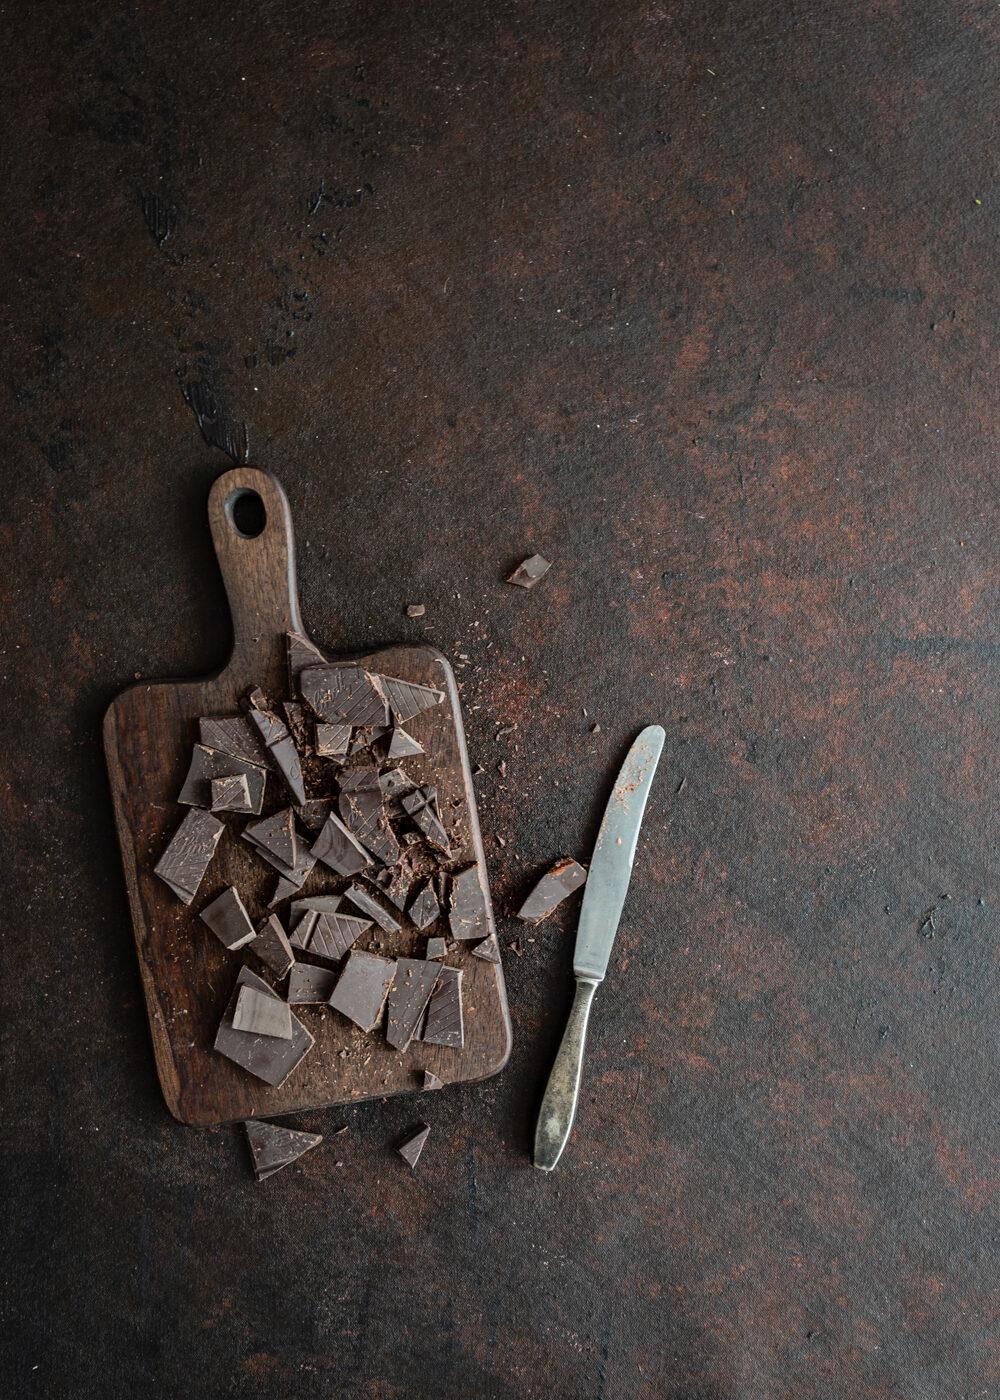 ruokakuvausalusta, kuvausalusta, kuvausalusta suklaa